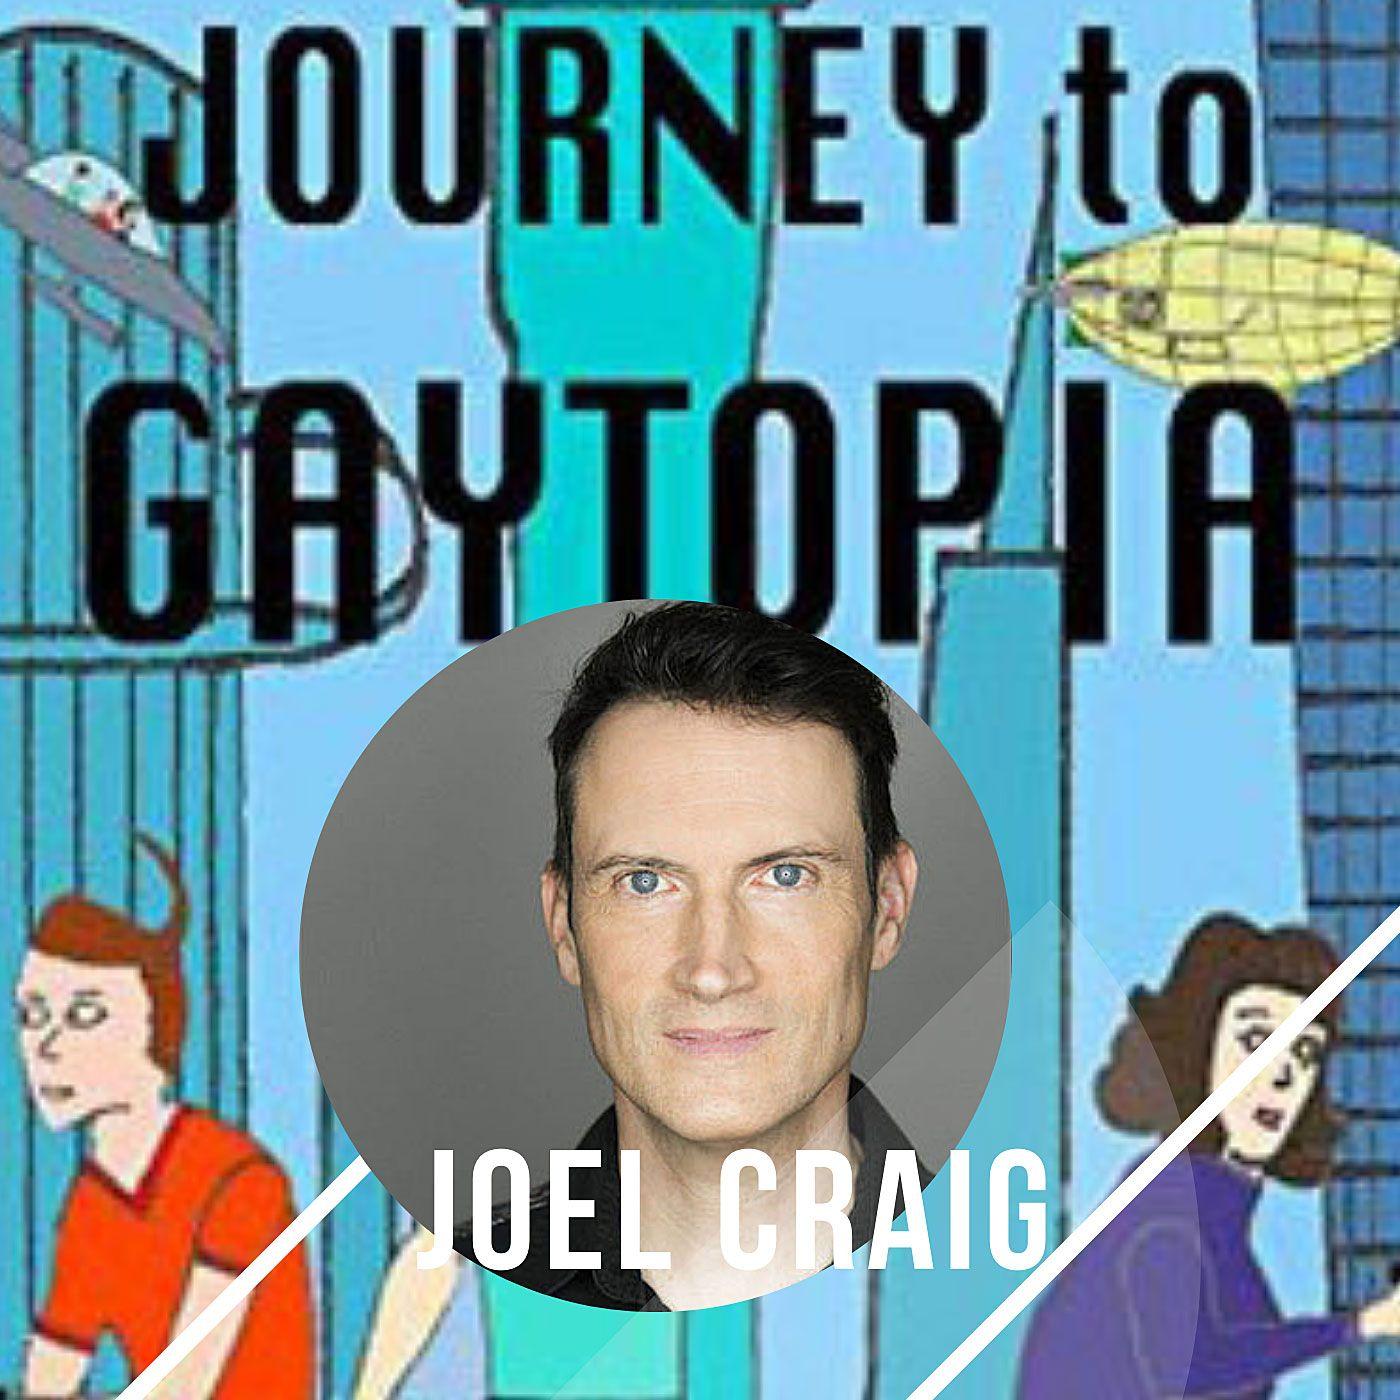 Joel Craig  Journey To Gaytopia